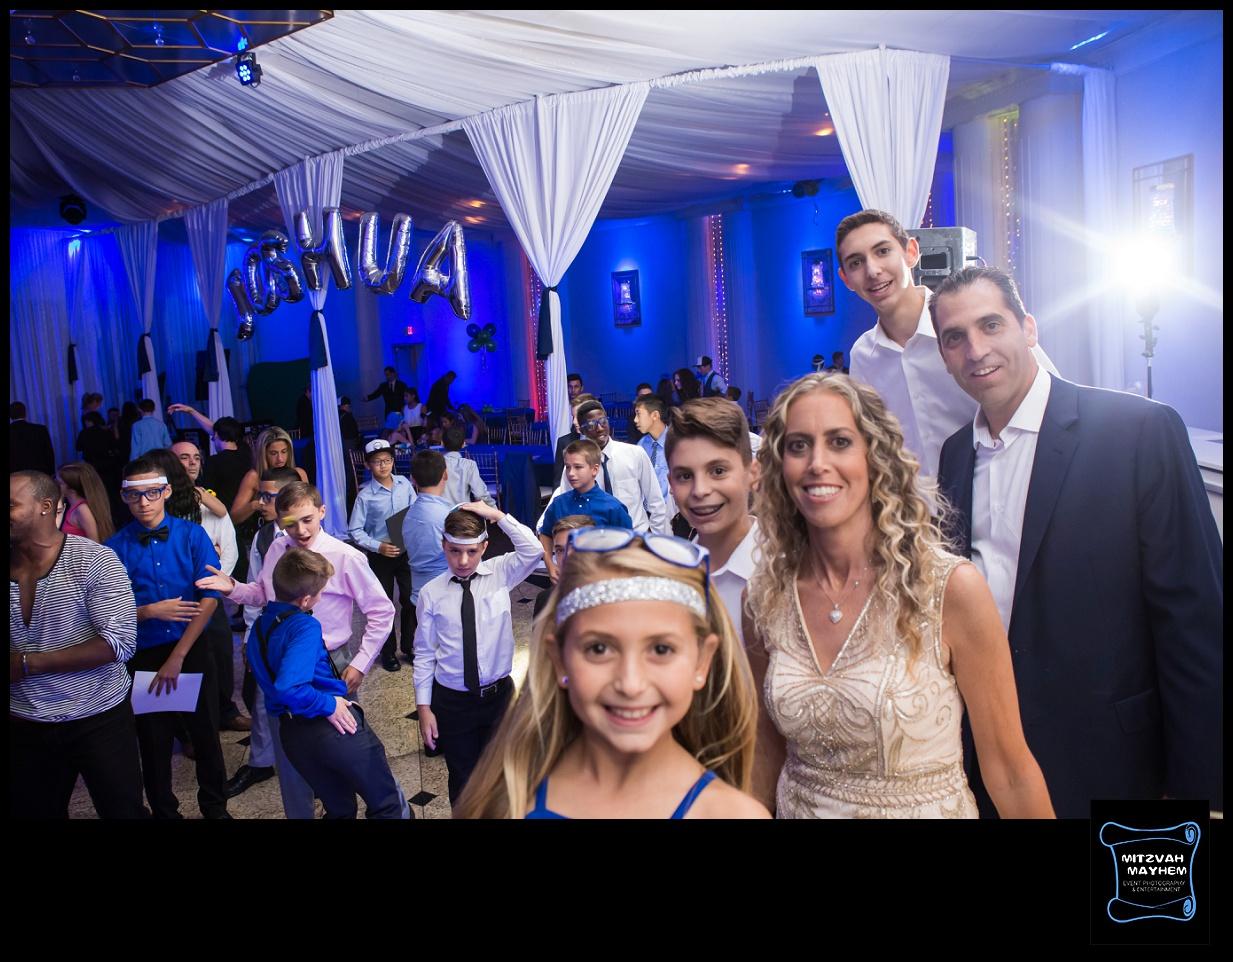 bnai-tikvah-bar-mitzvah-photographer-8787.JPG